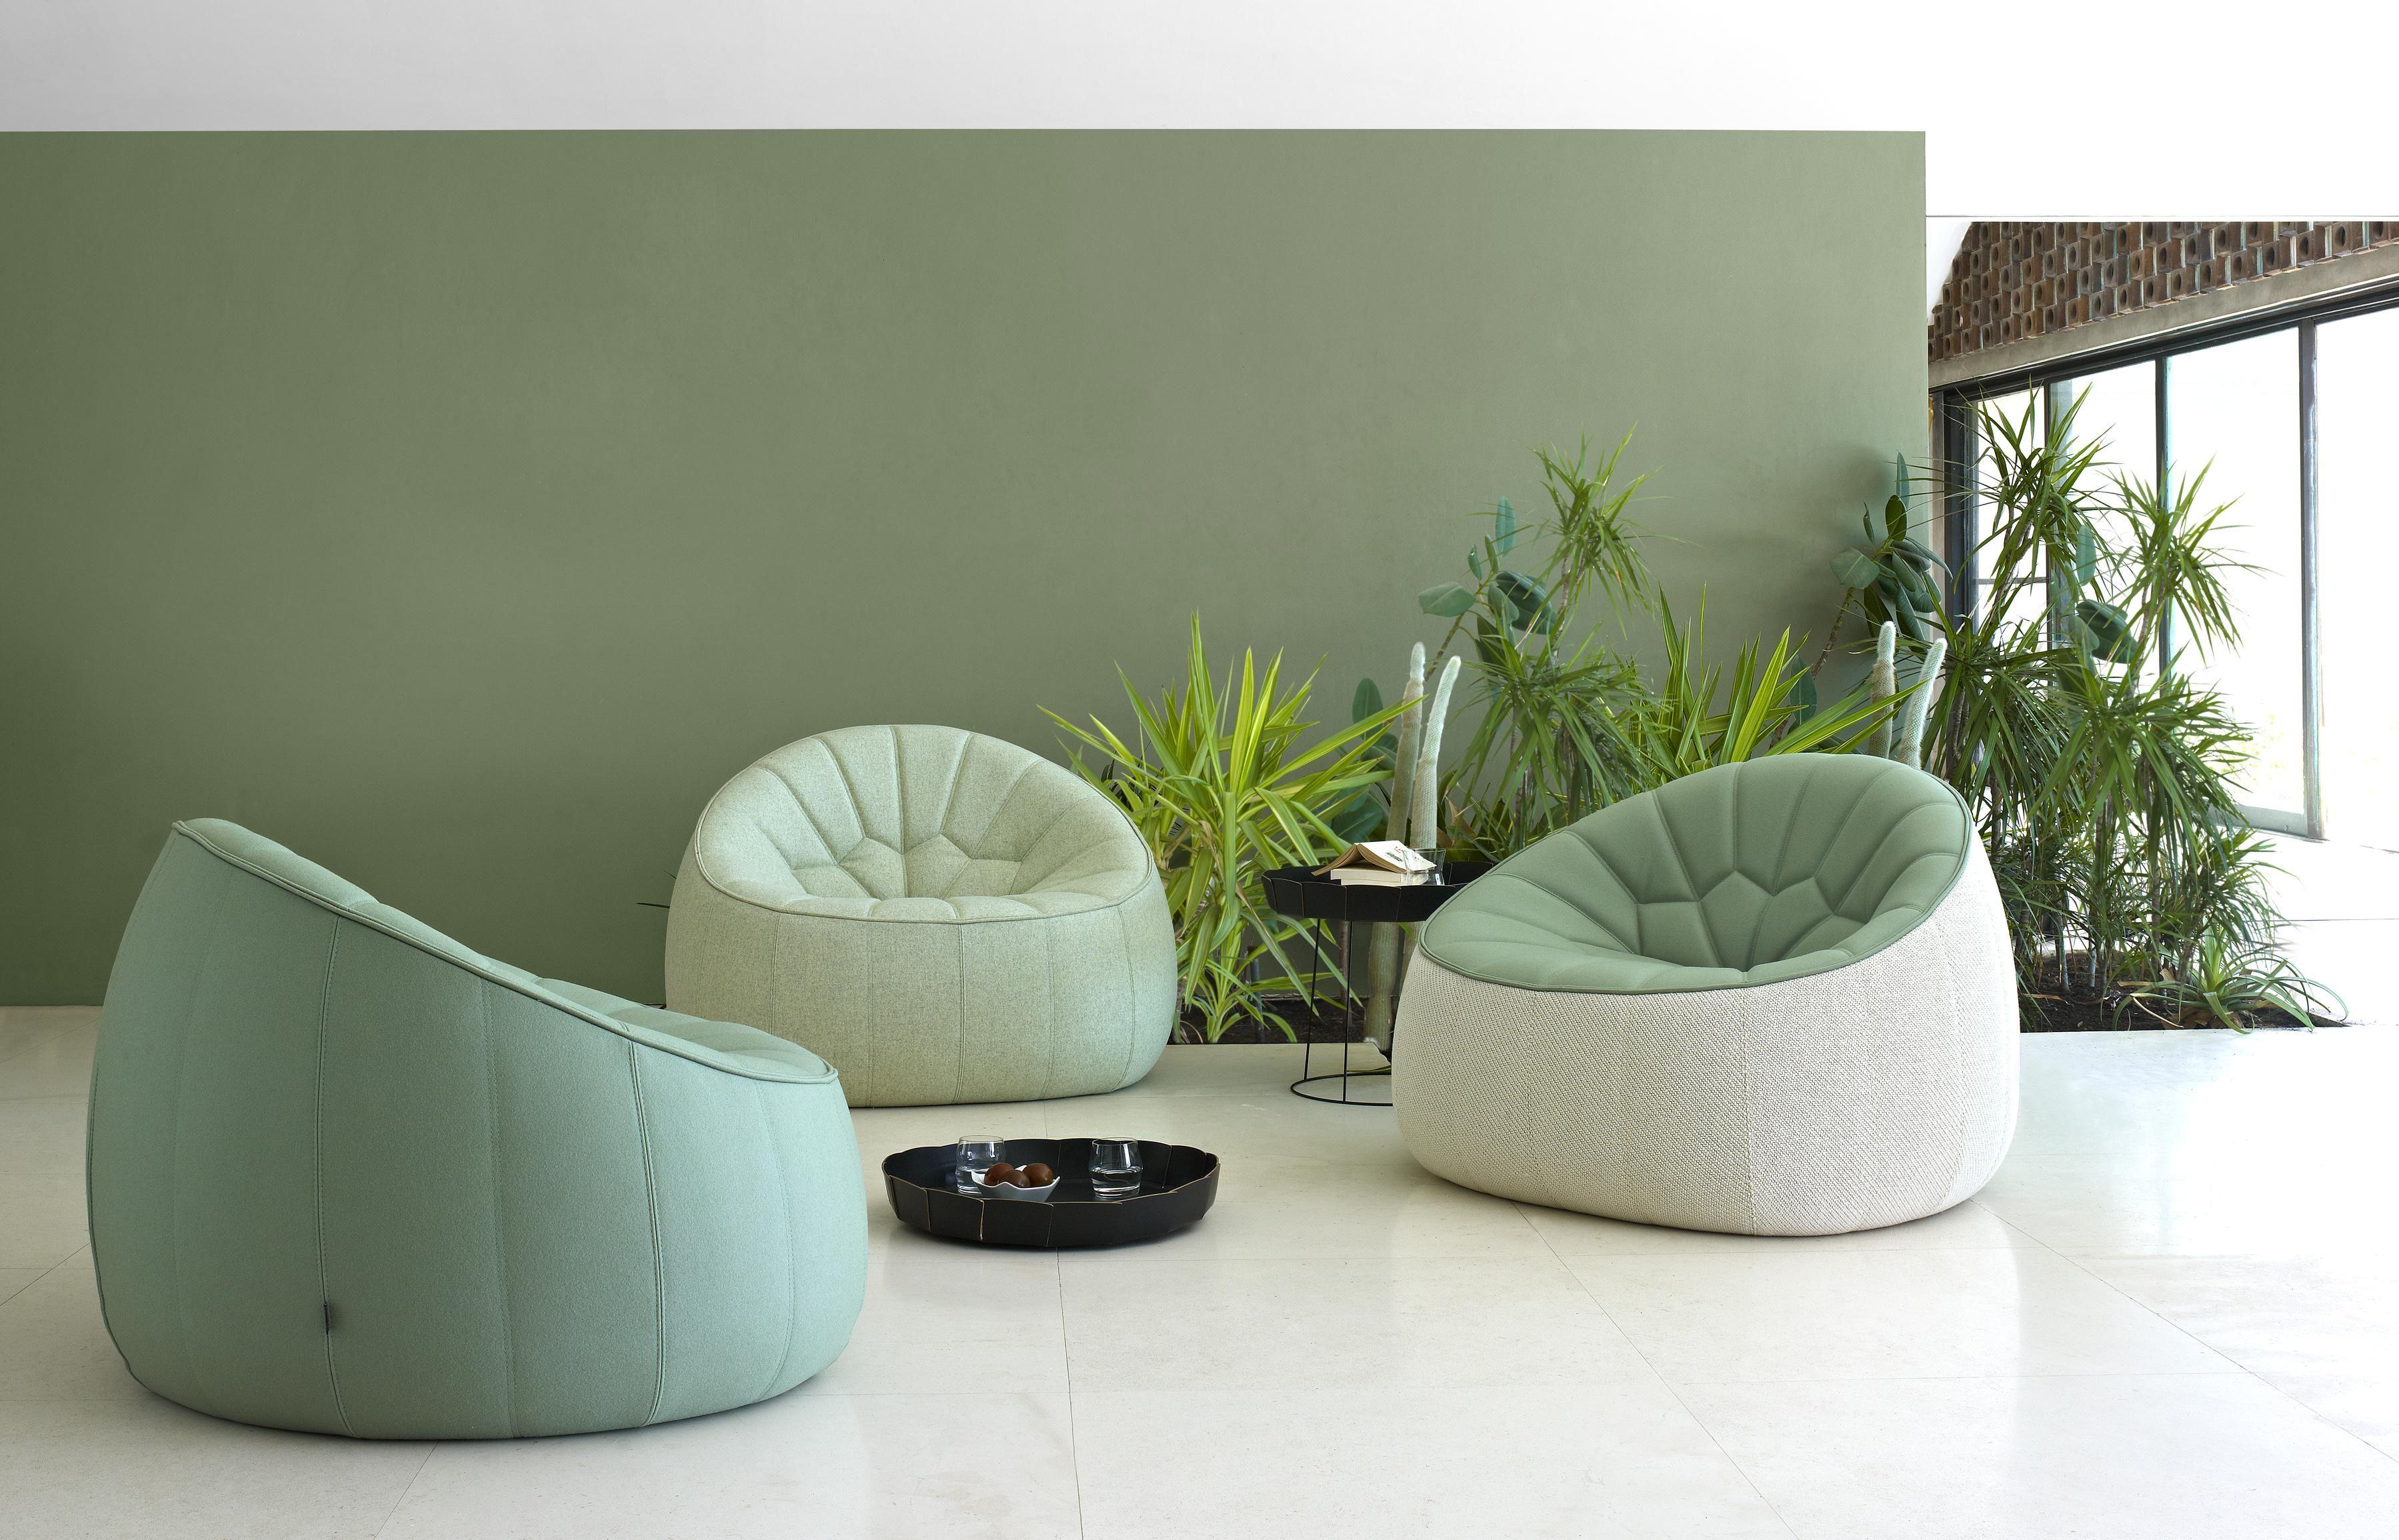 ottoman armchairs designer no duchaufour lawrance ligne roset great chairs pinterest. Black Bedroom Furniture Sets. Home Design Ideas